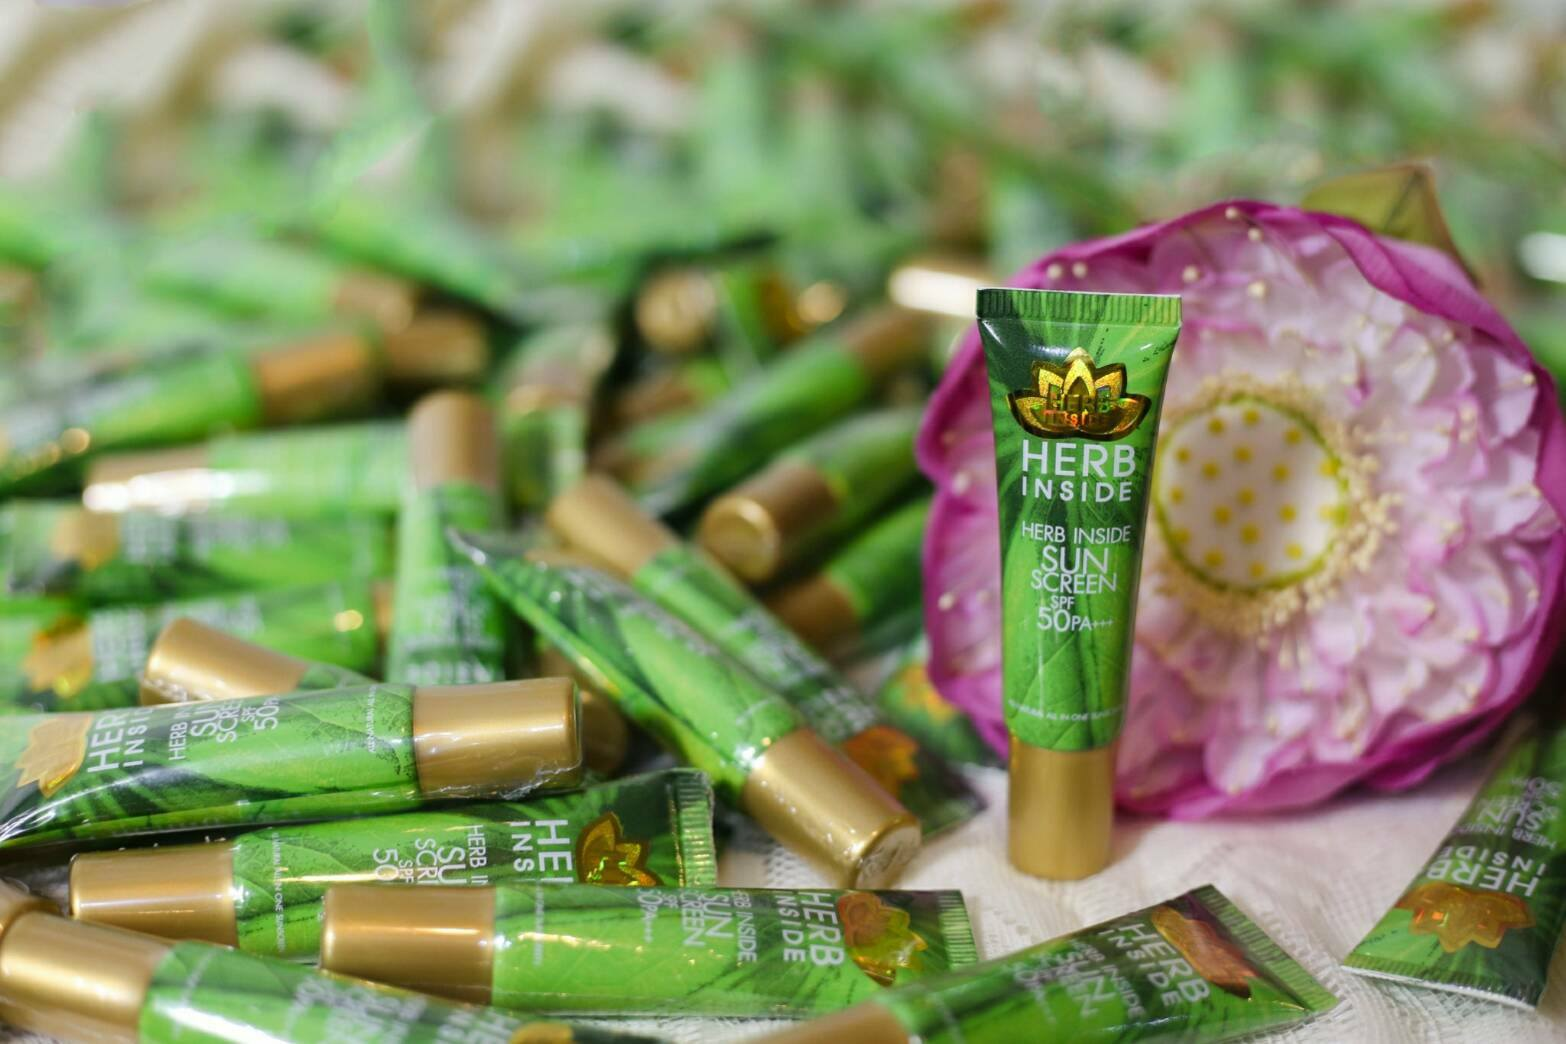 Herb Inside Sunscreen 15 g. กันแดด เฮิร์บ อินไซด์ กันแดดสมุนไพร